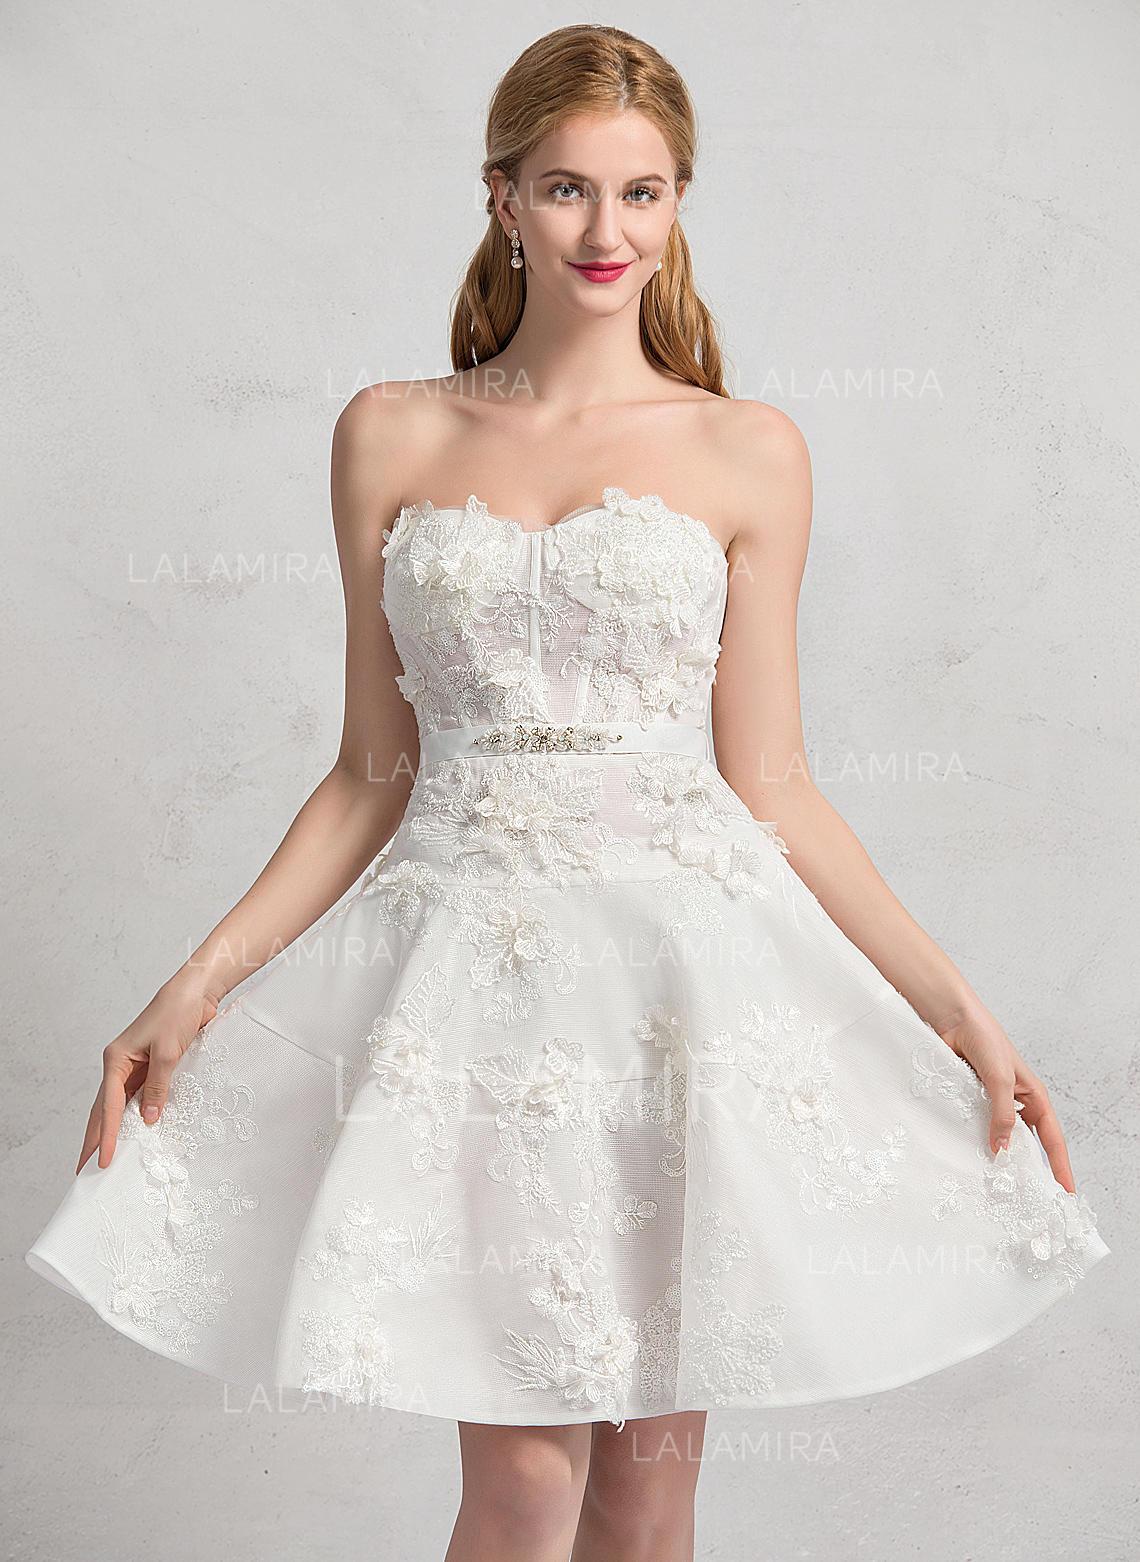 3b5918b23b Sweetheart A-Line Princess Wedding Dresses Lace Beading Sequins Sleeveless  Knee-Length (. Loading zoom